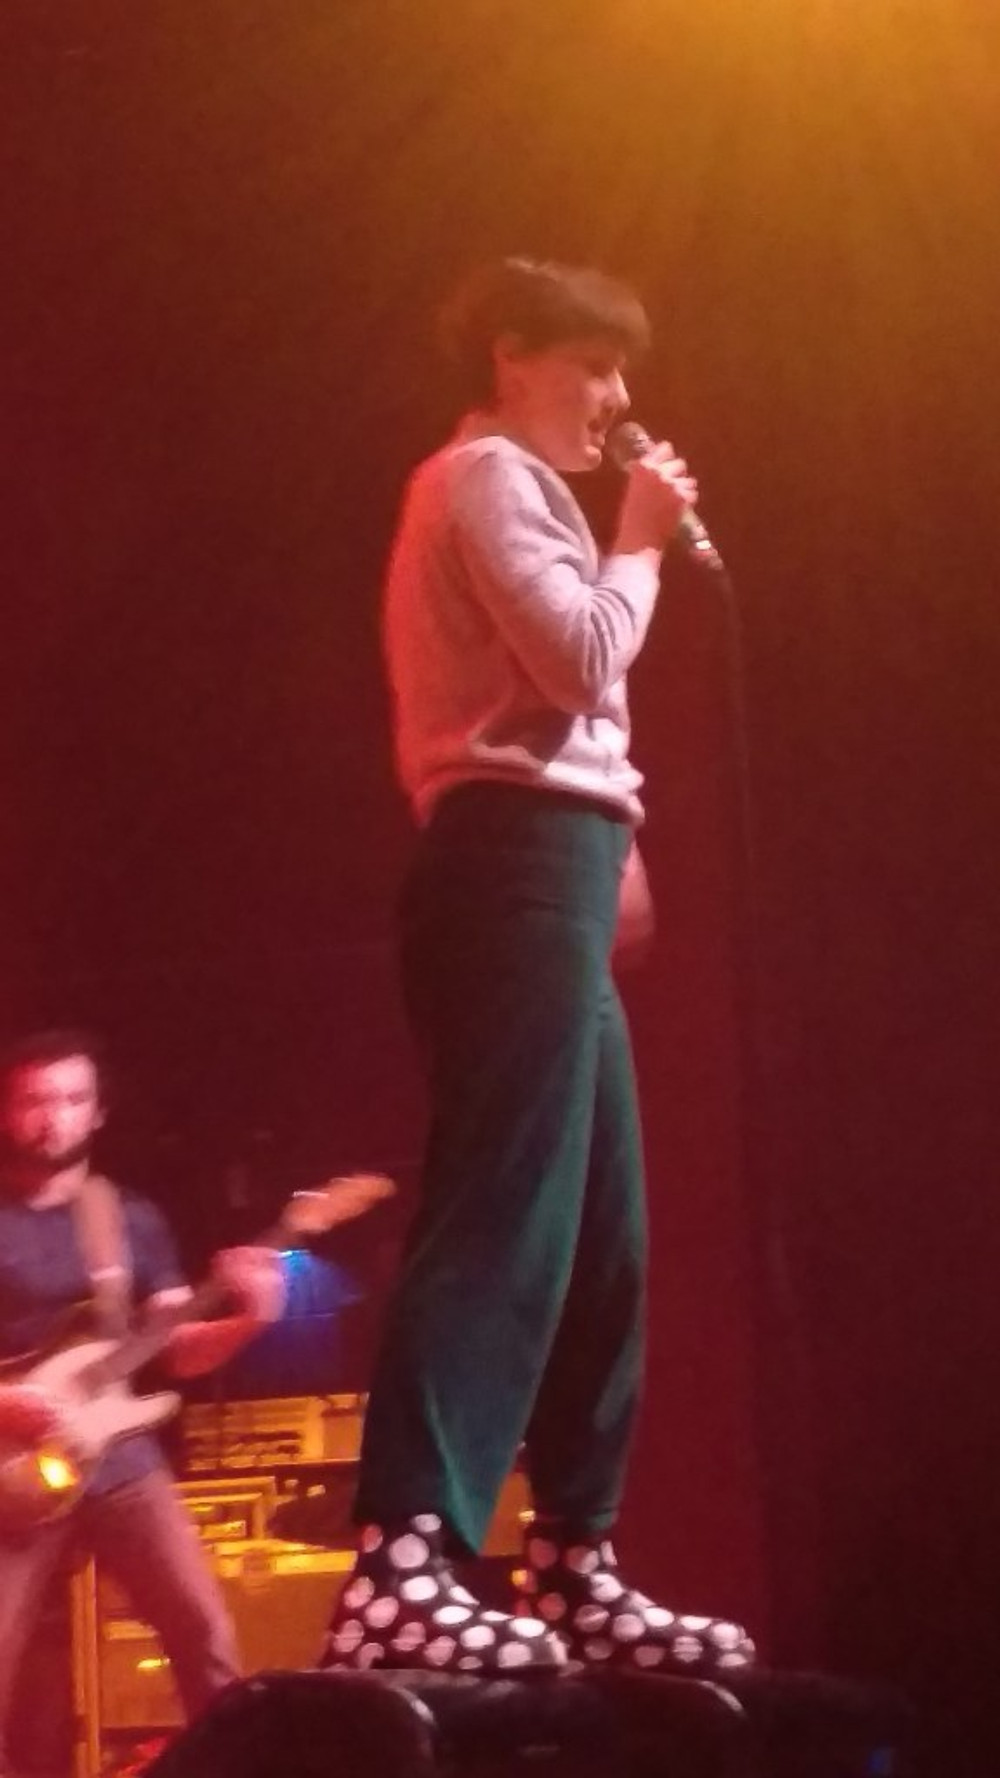 Lead singer Kalmia Traver wearing polka dot rain boots.